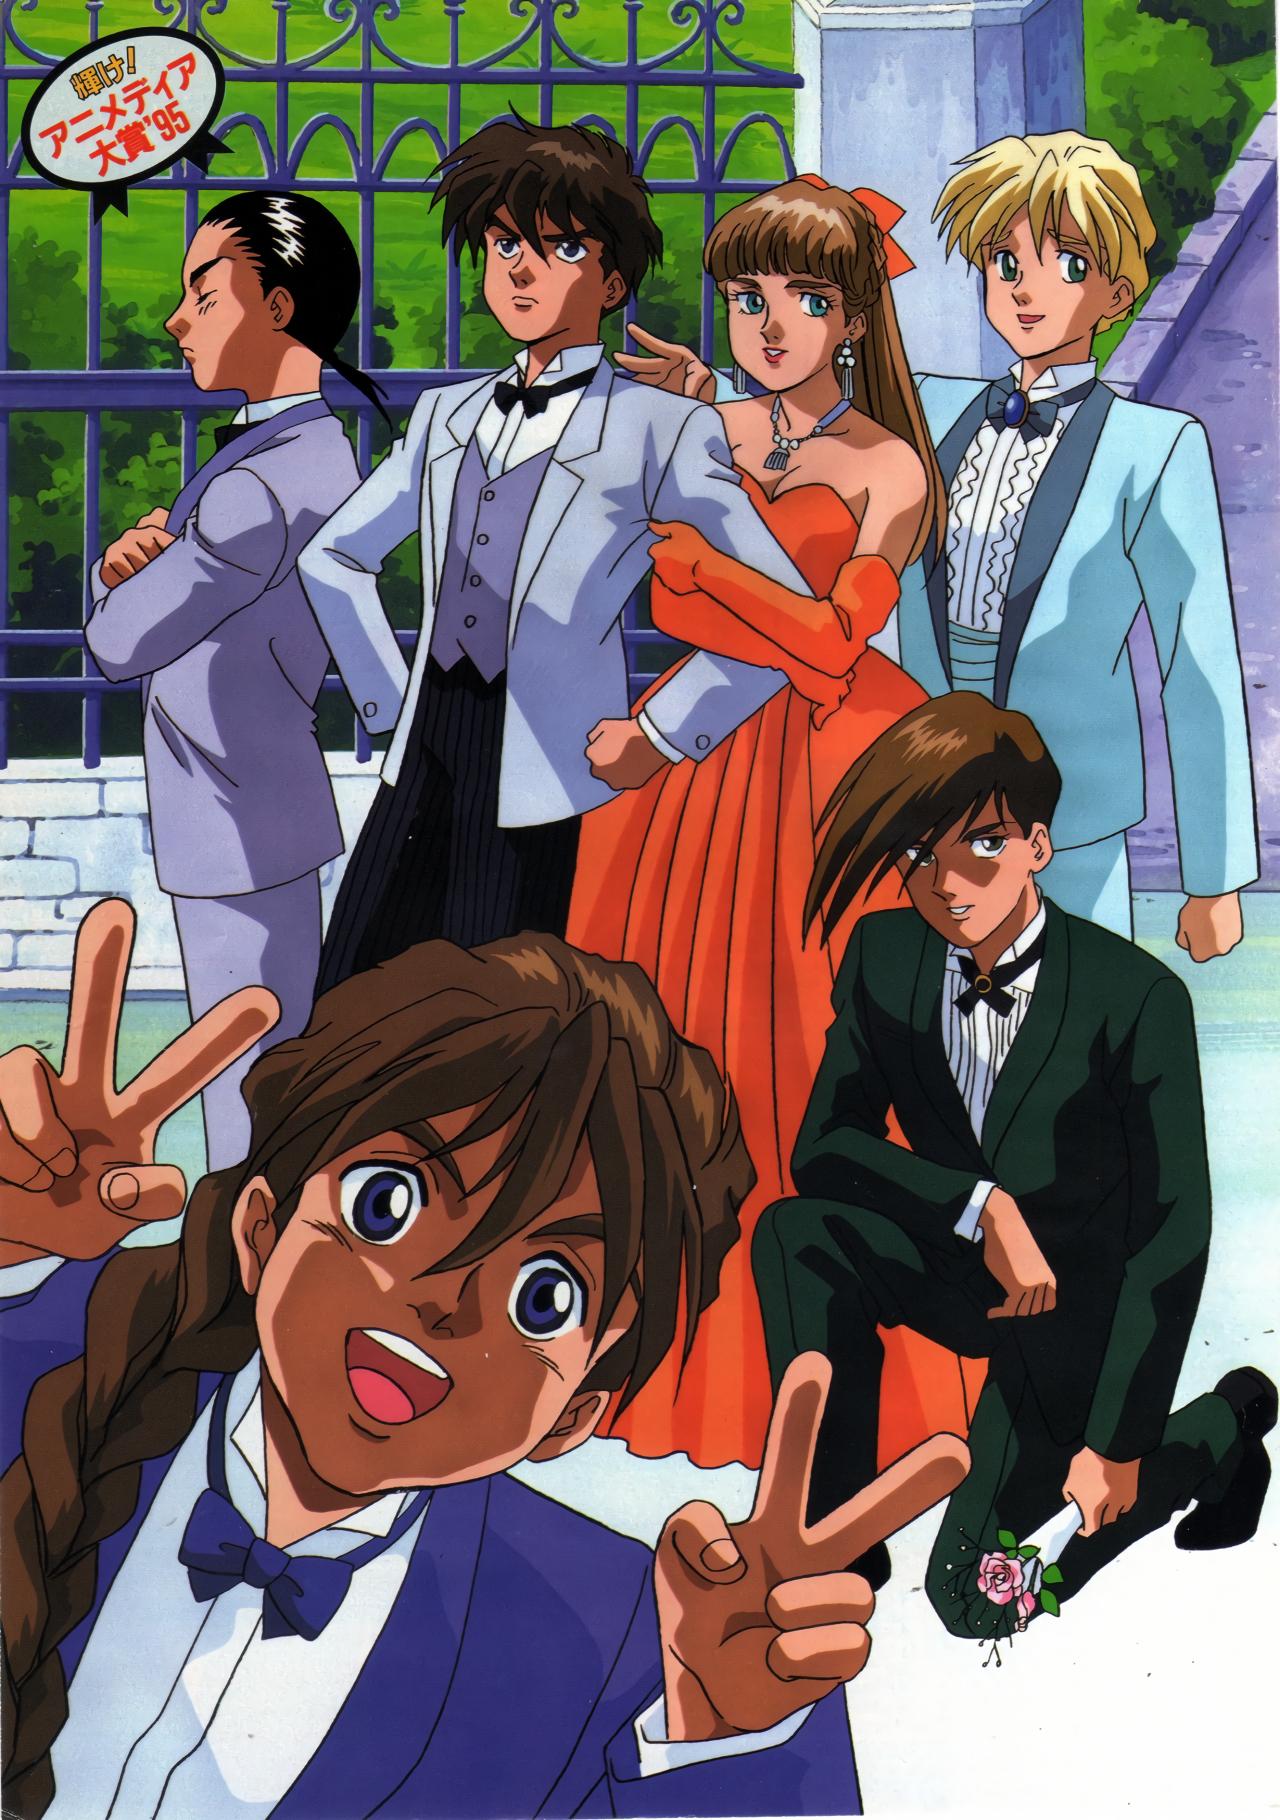 Animedia 02 1996 mobile suit gundam wing illustrated by tsuyoshi kawada